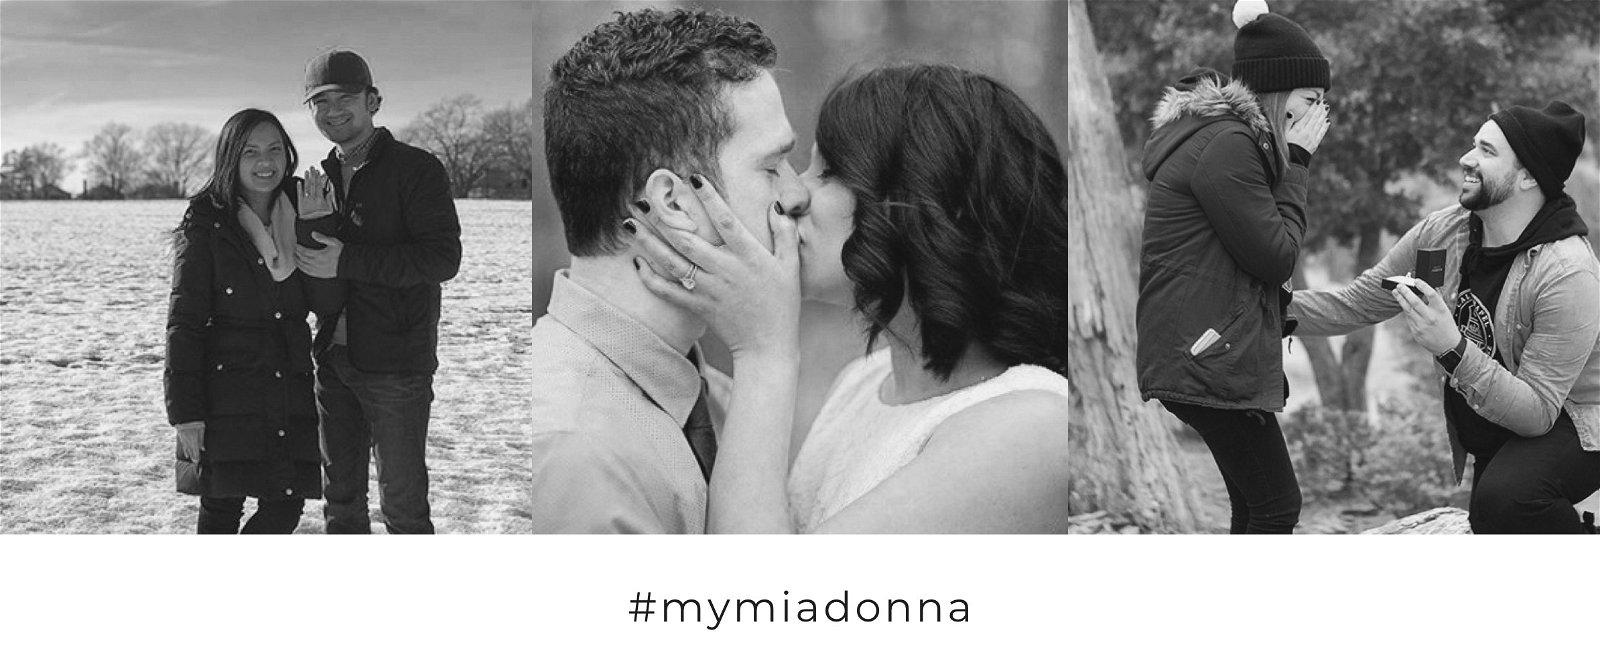 #mymiadonna